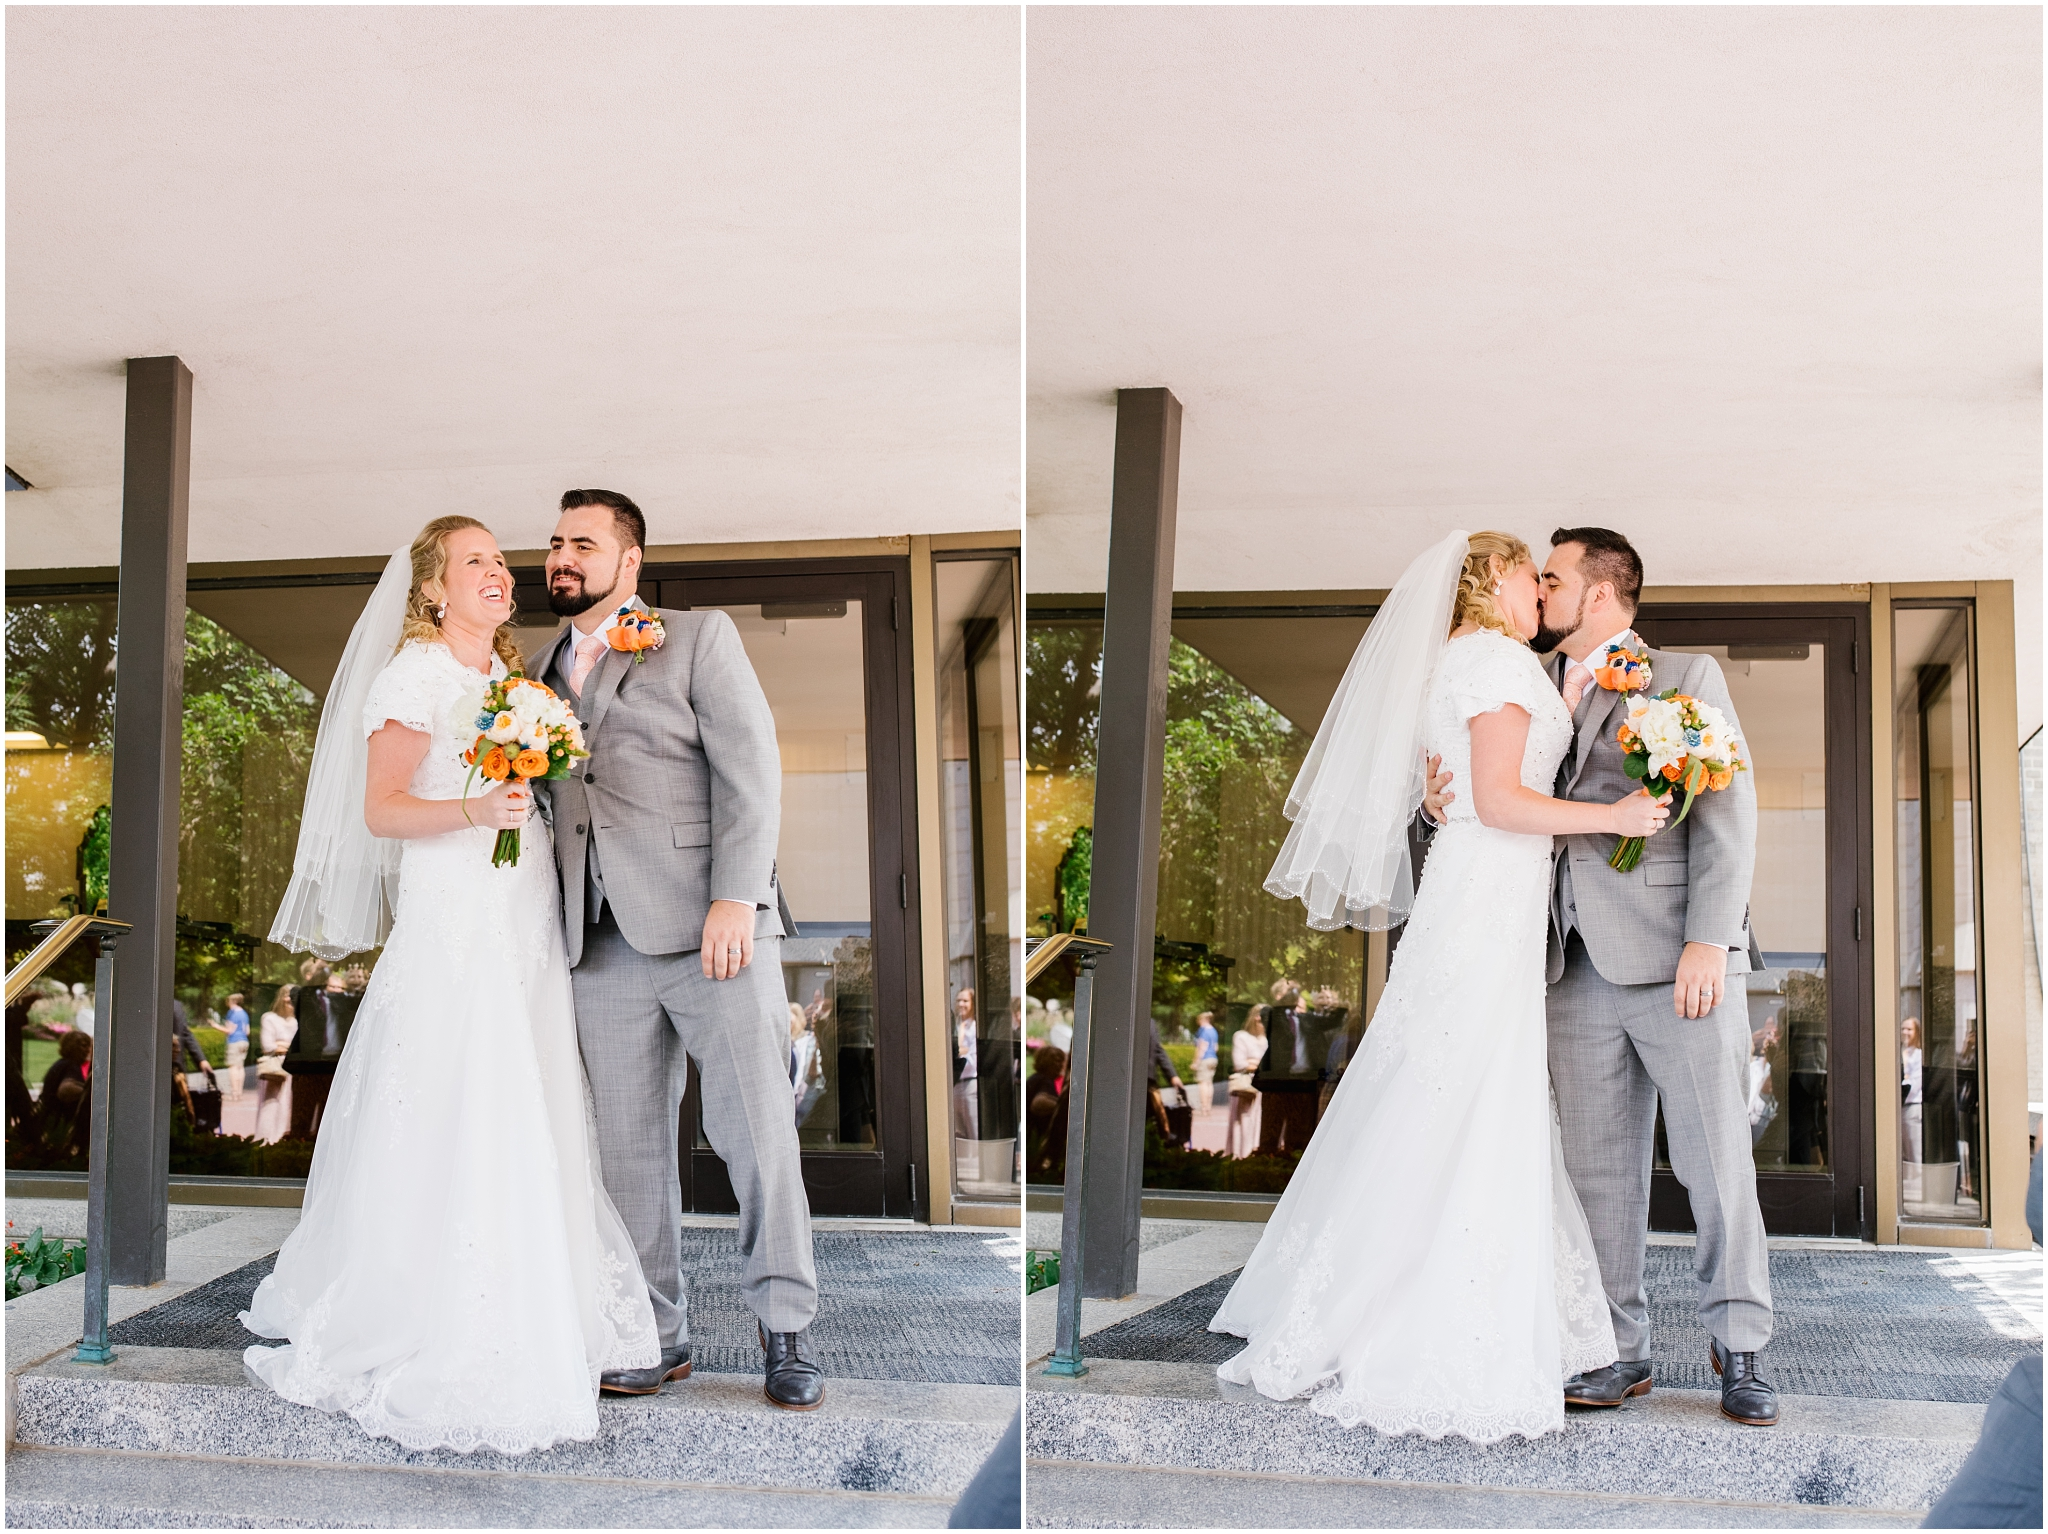 Justin and Melissa-7_Lizzie-B-Imagery-Utah-Wedding-Photographer-Salt-Lake-City-Temple-The-Grand-Ballroom.jpg